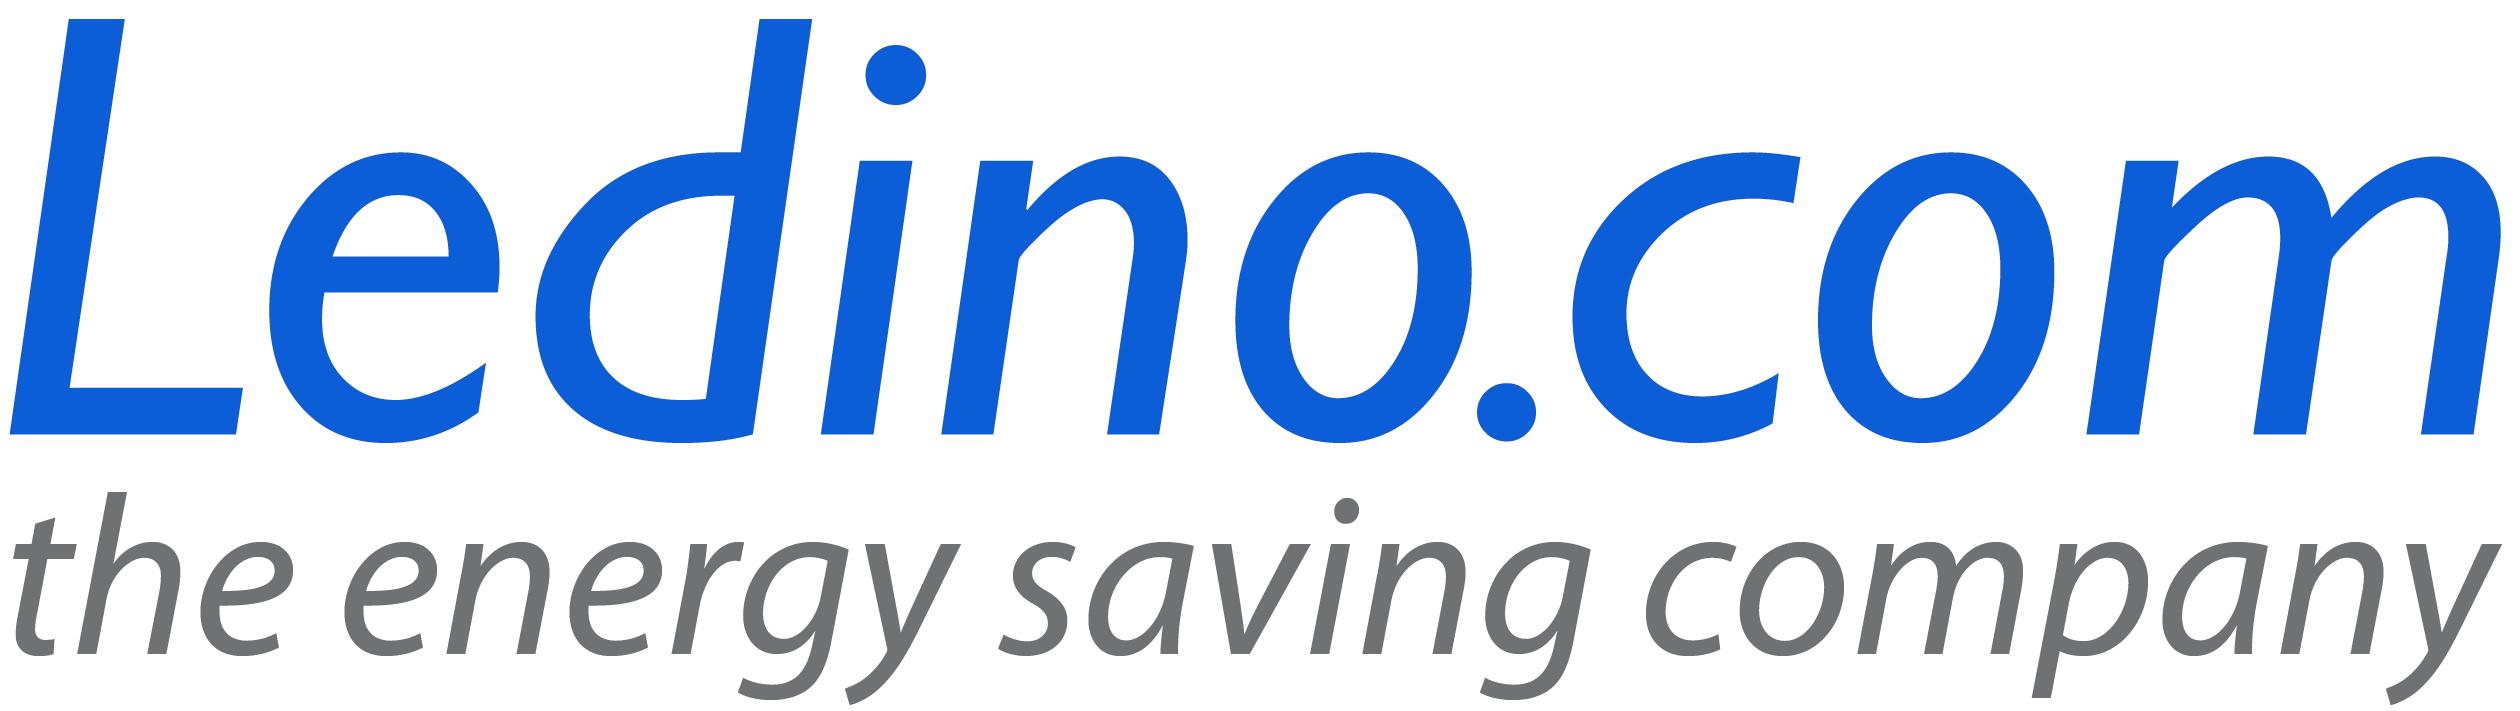 Ledino GmbH - the energy saving company